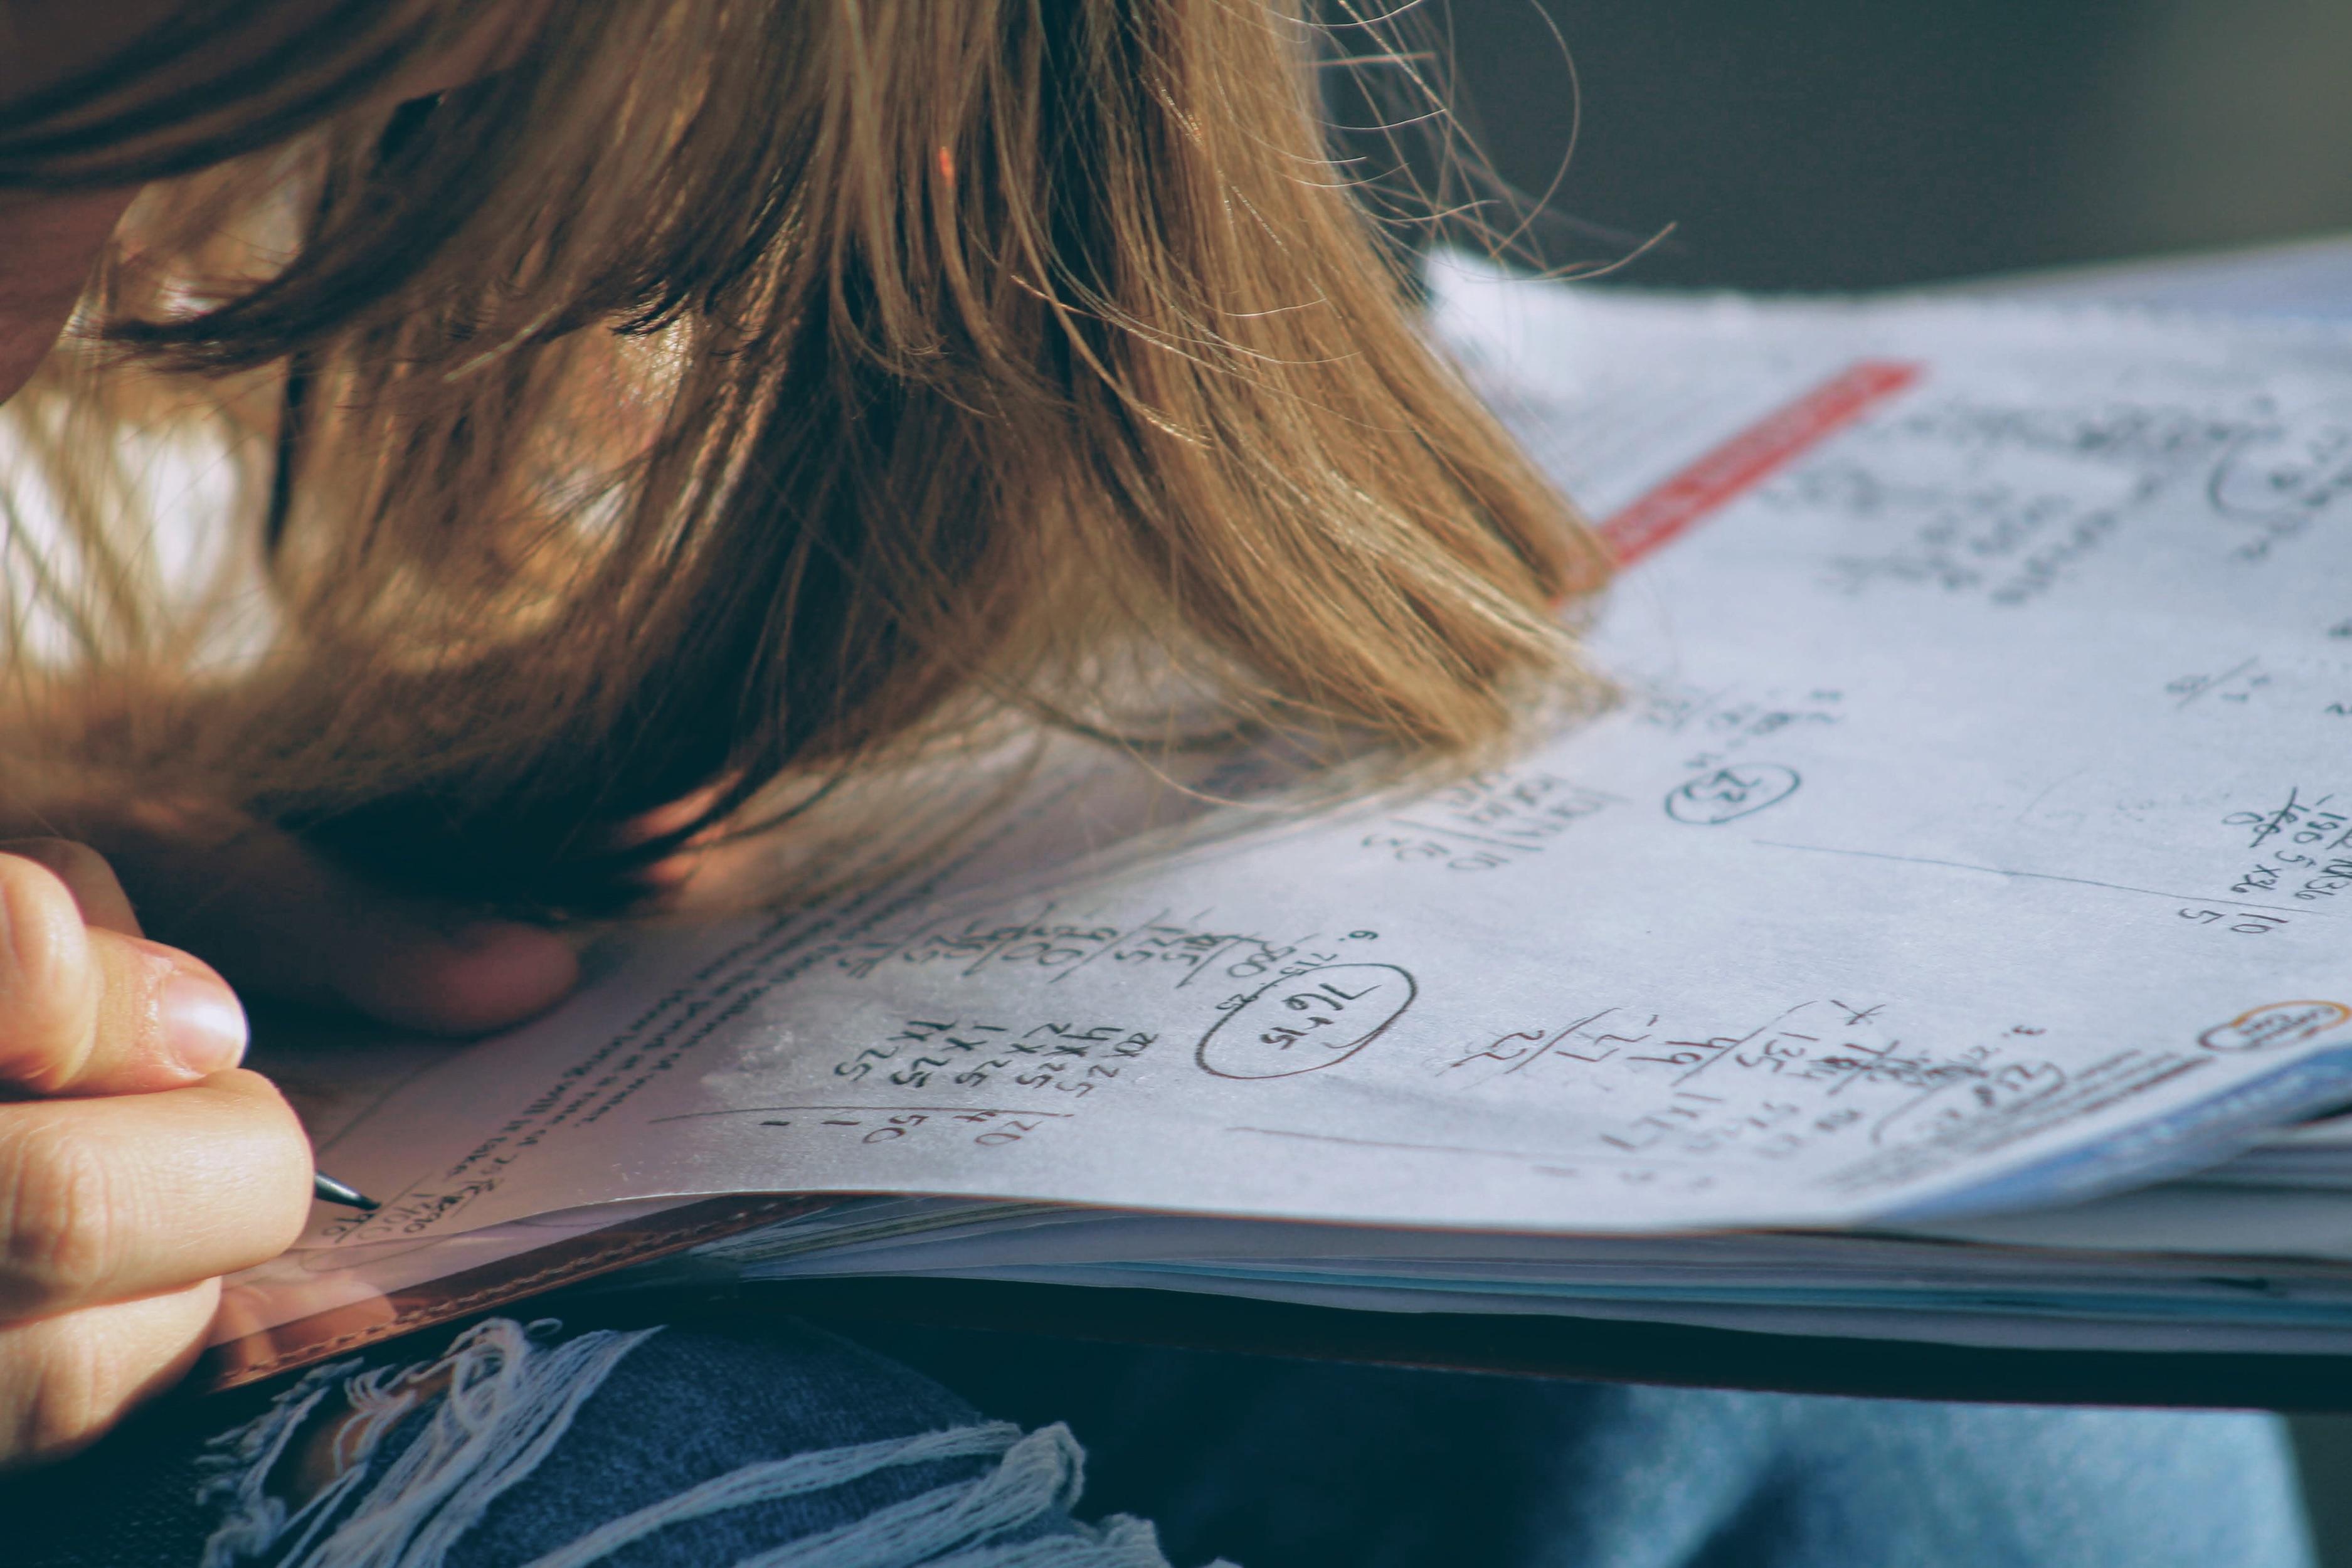 The Homework Act